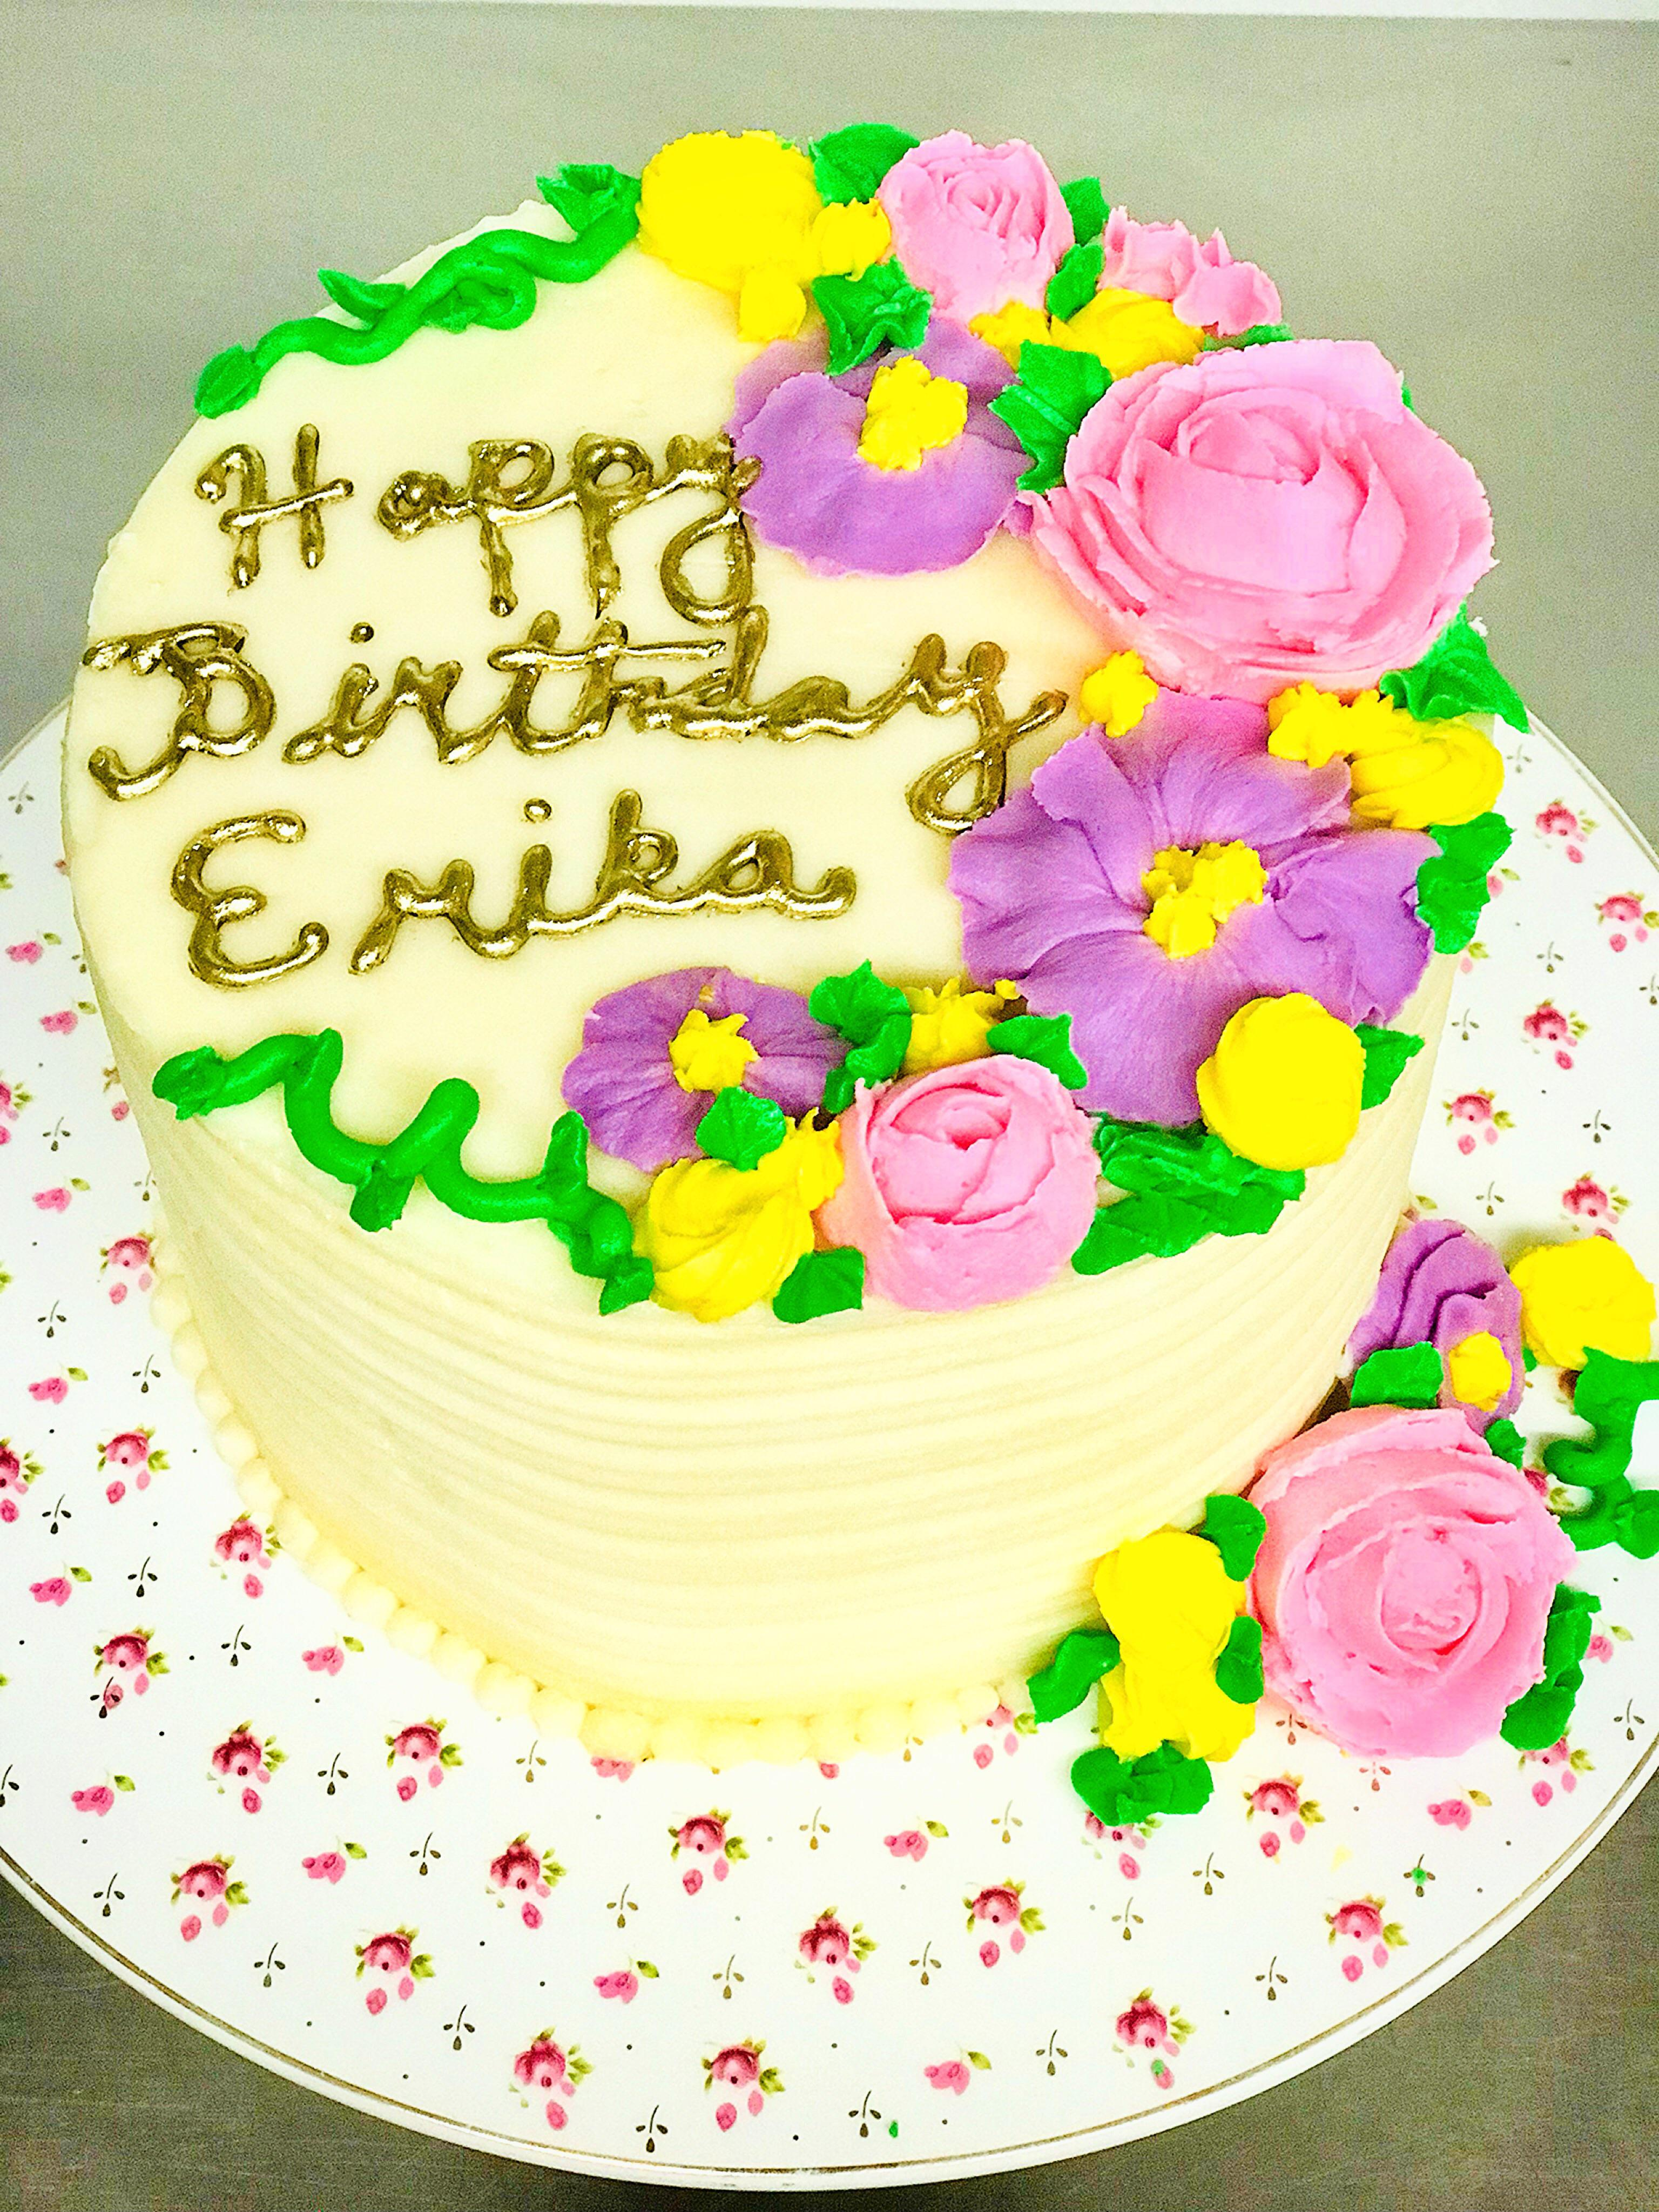 Made A Cute Bday Cake At Work Today Happy Birthday Erika Baking